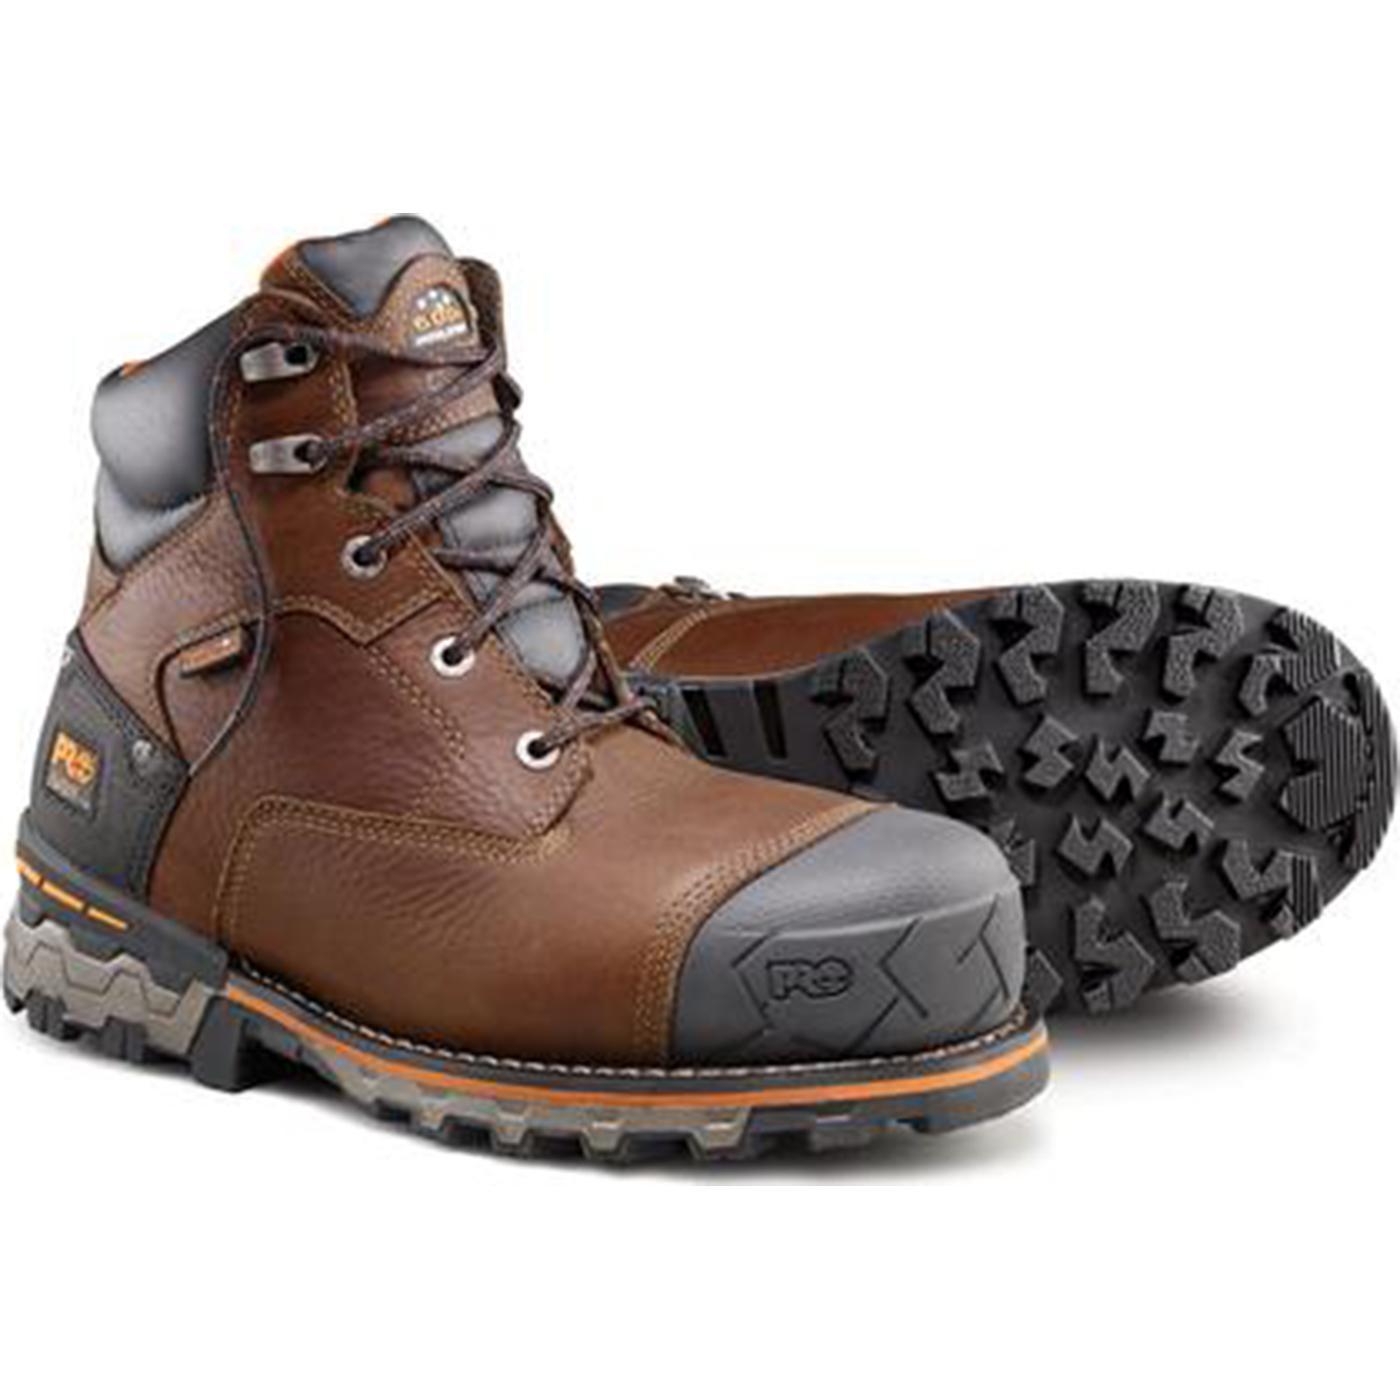 d39583d4d4b Timberland PRO Boondock Composite Toe Waterproof Insulated Work Boot